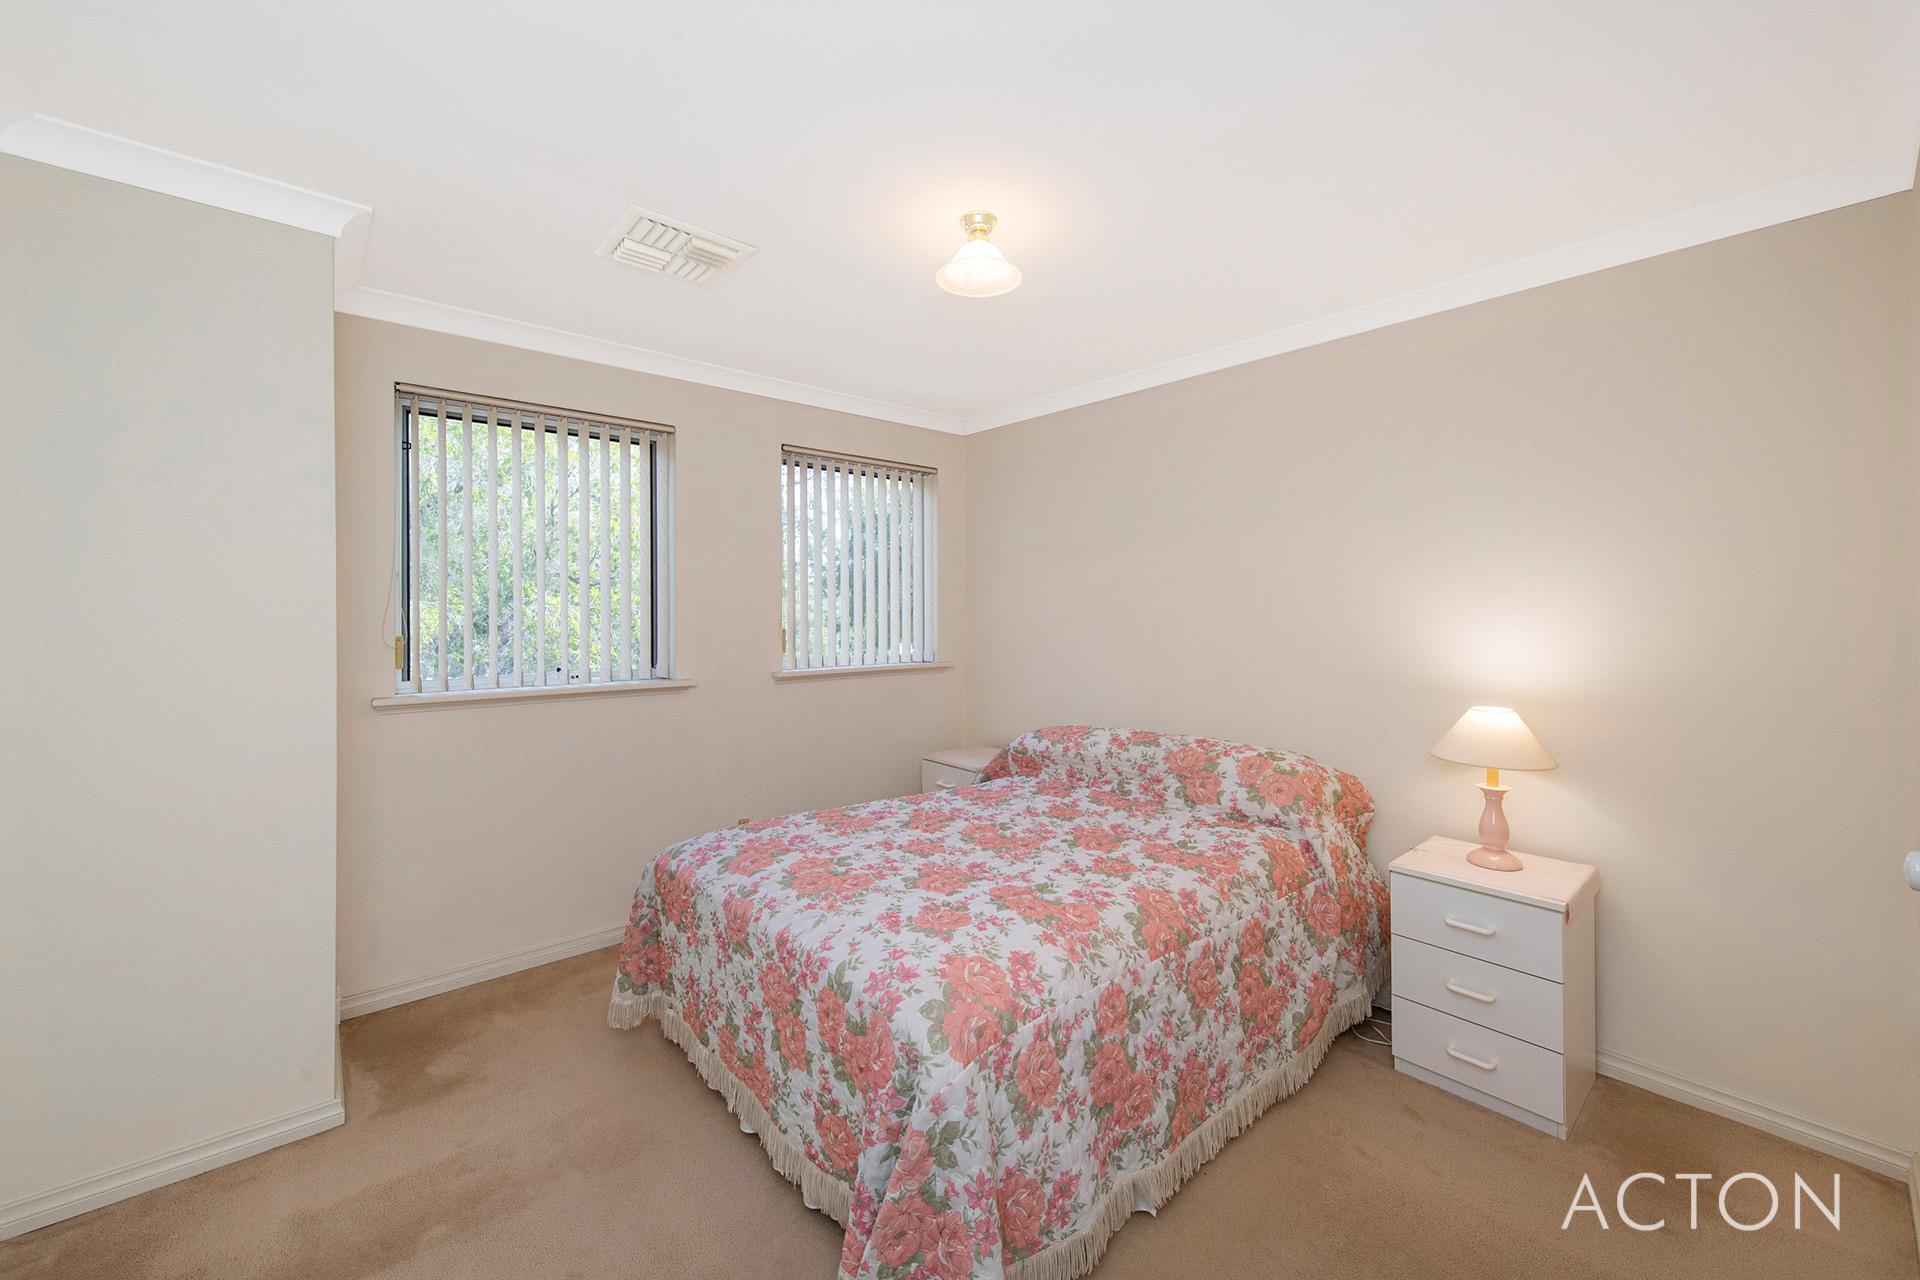 4A McCallum Crescent Ardross - House For Sale - 23238515 - ACTON Applecross